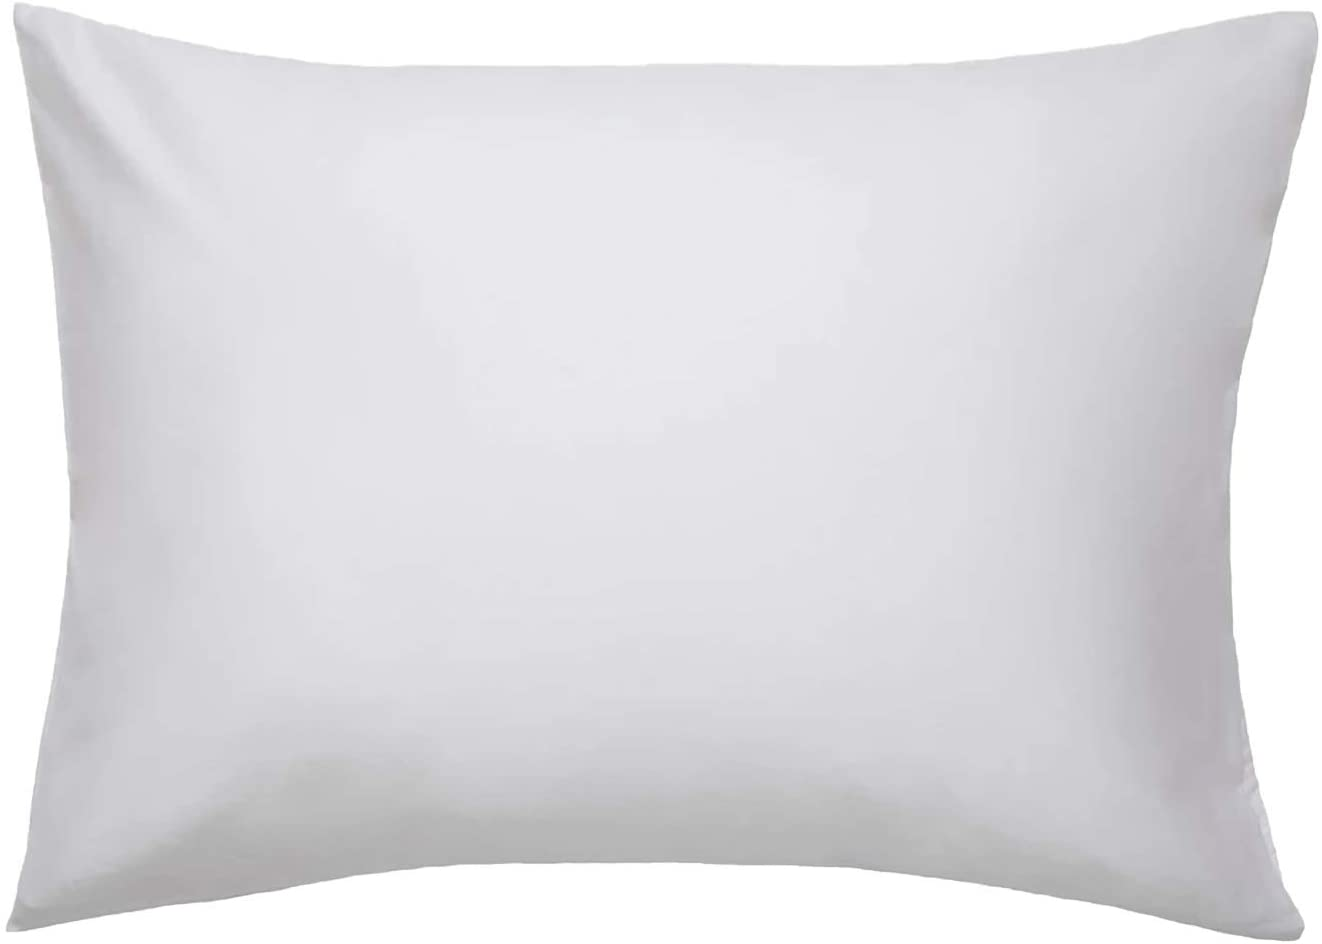 brooklinen-king-size-pillowcases